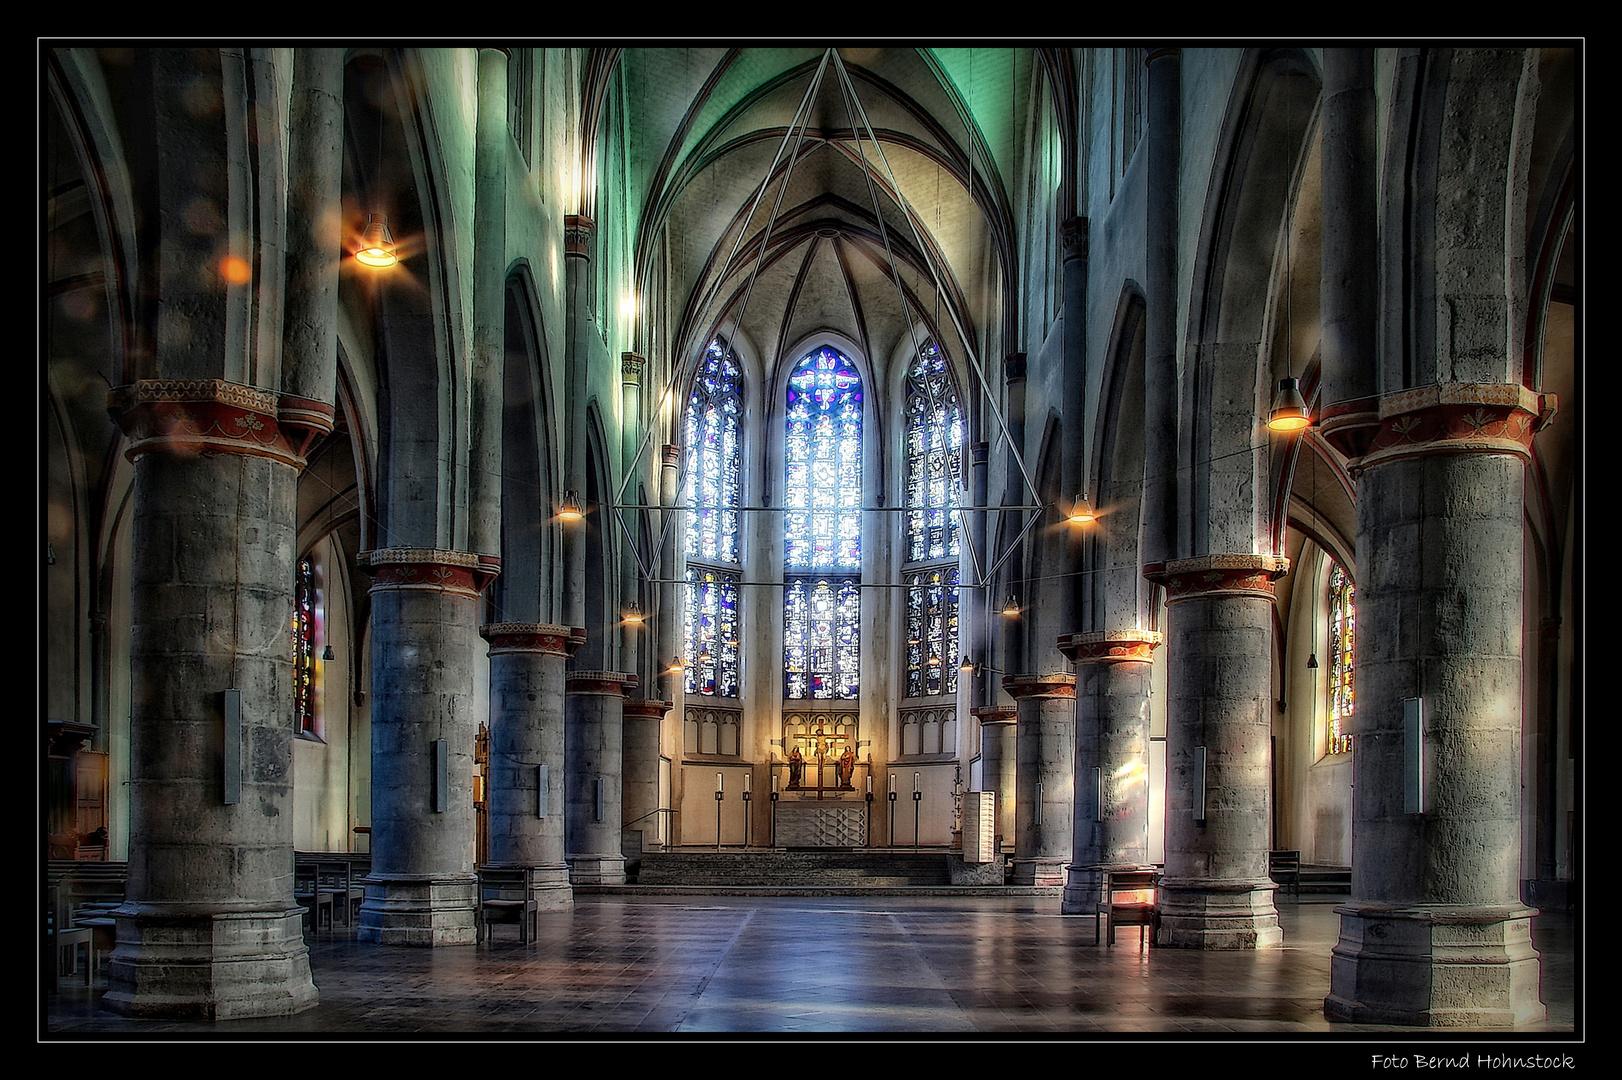 Citykirche Mönchengladbach.....